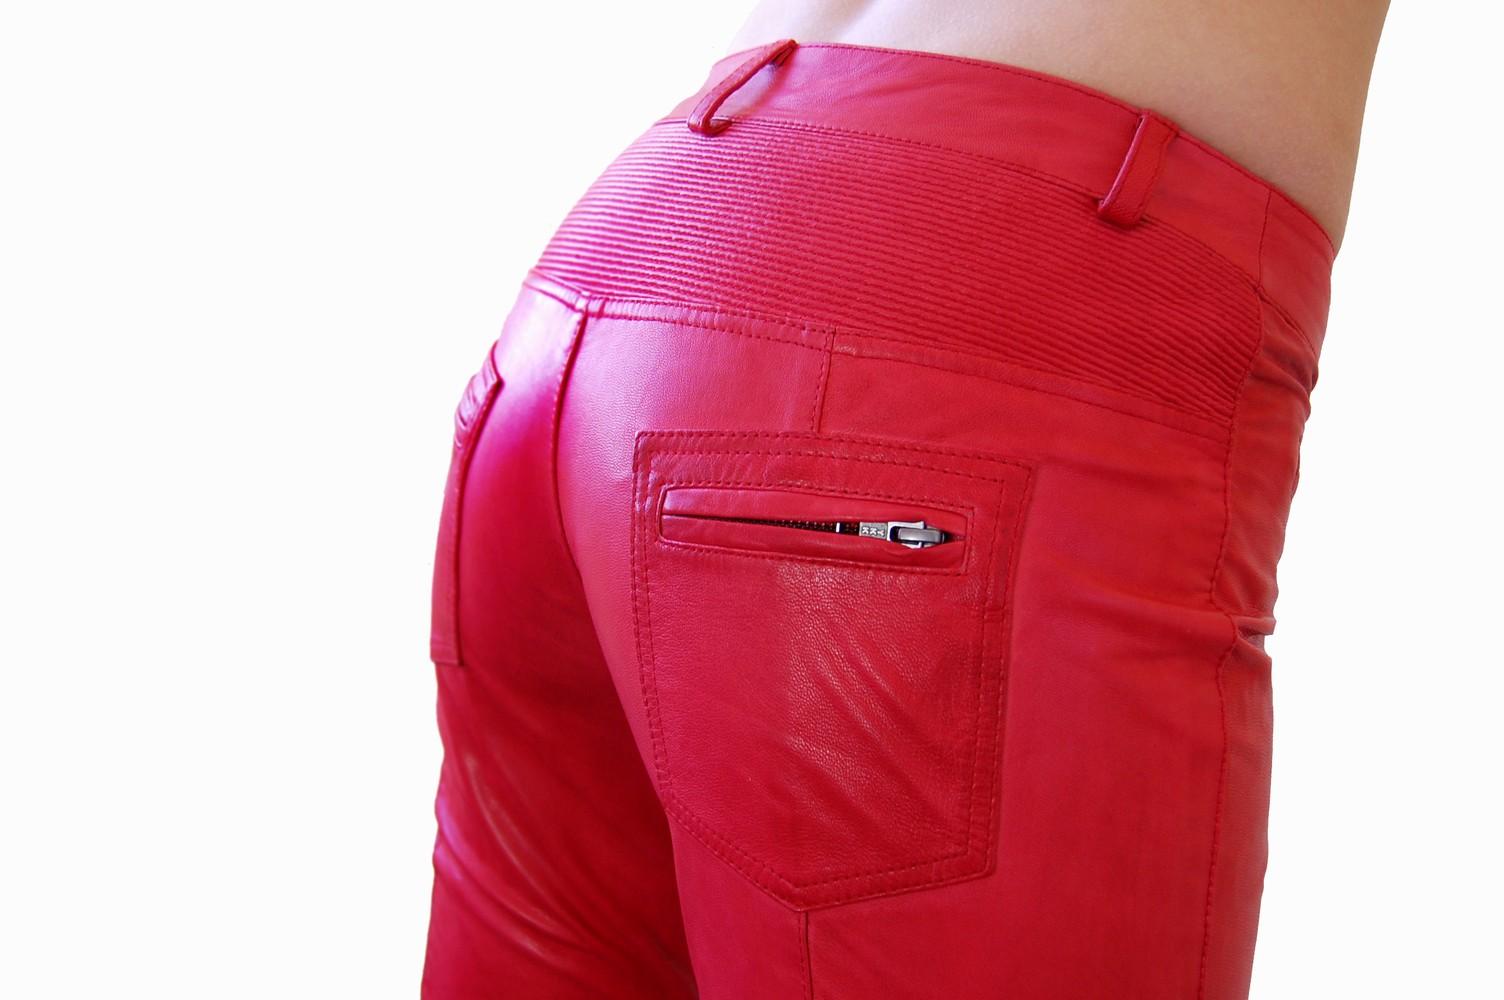 Damen-Lederhose Donna, Rot in 6 Farben, Bild 4